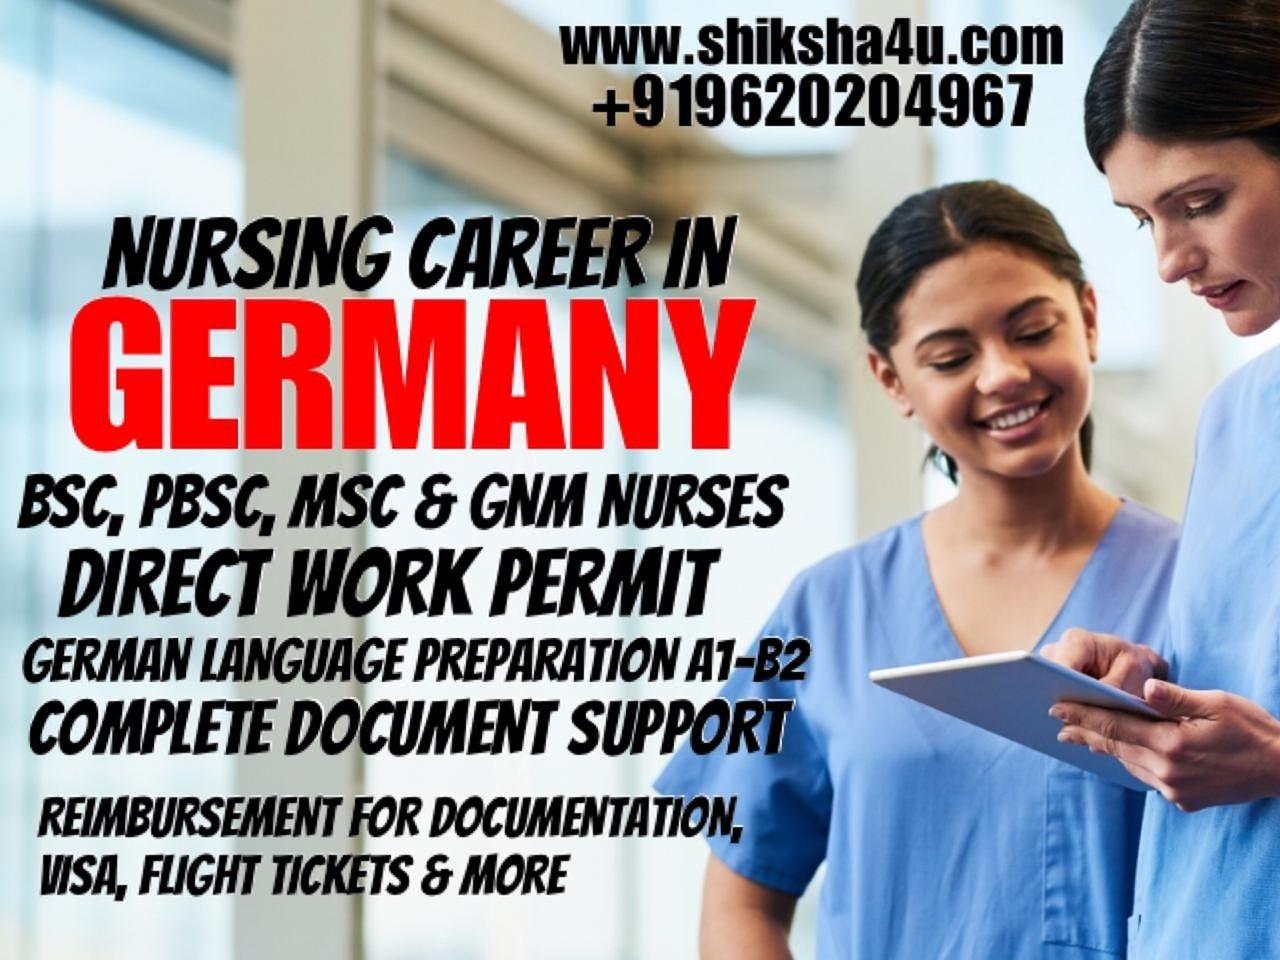 ca4460cc968392c7a091a9d28669d10d - How To Get A Job In Germany After Masters